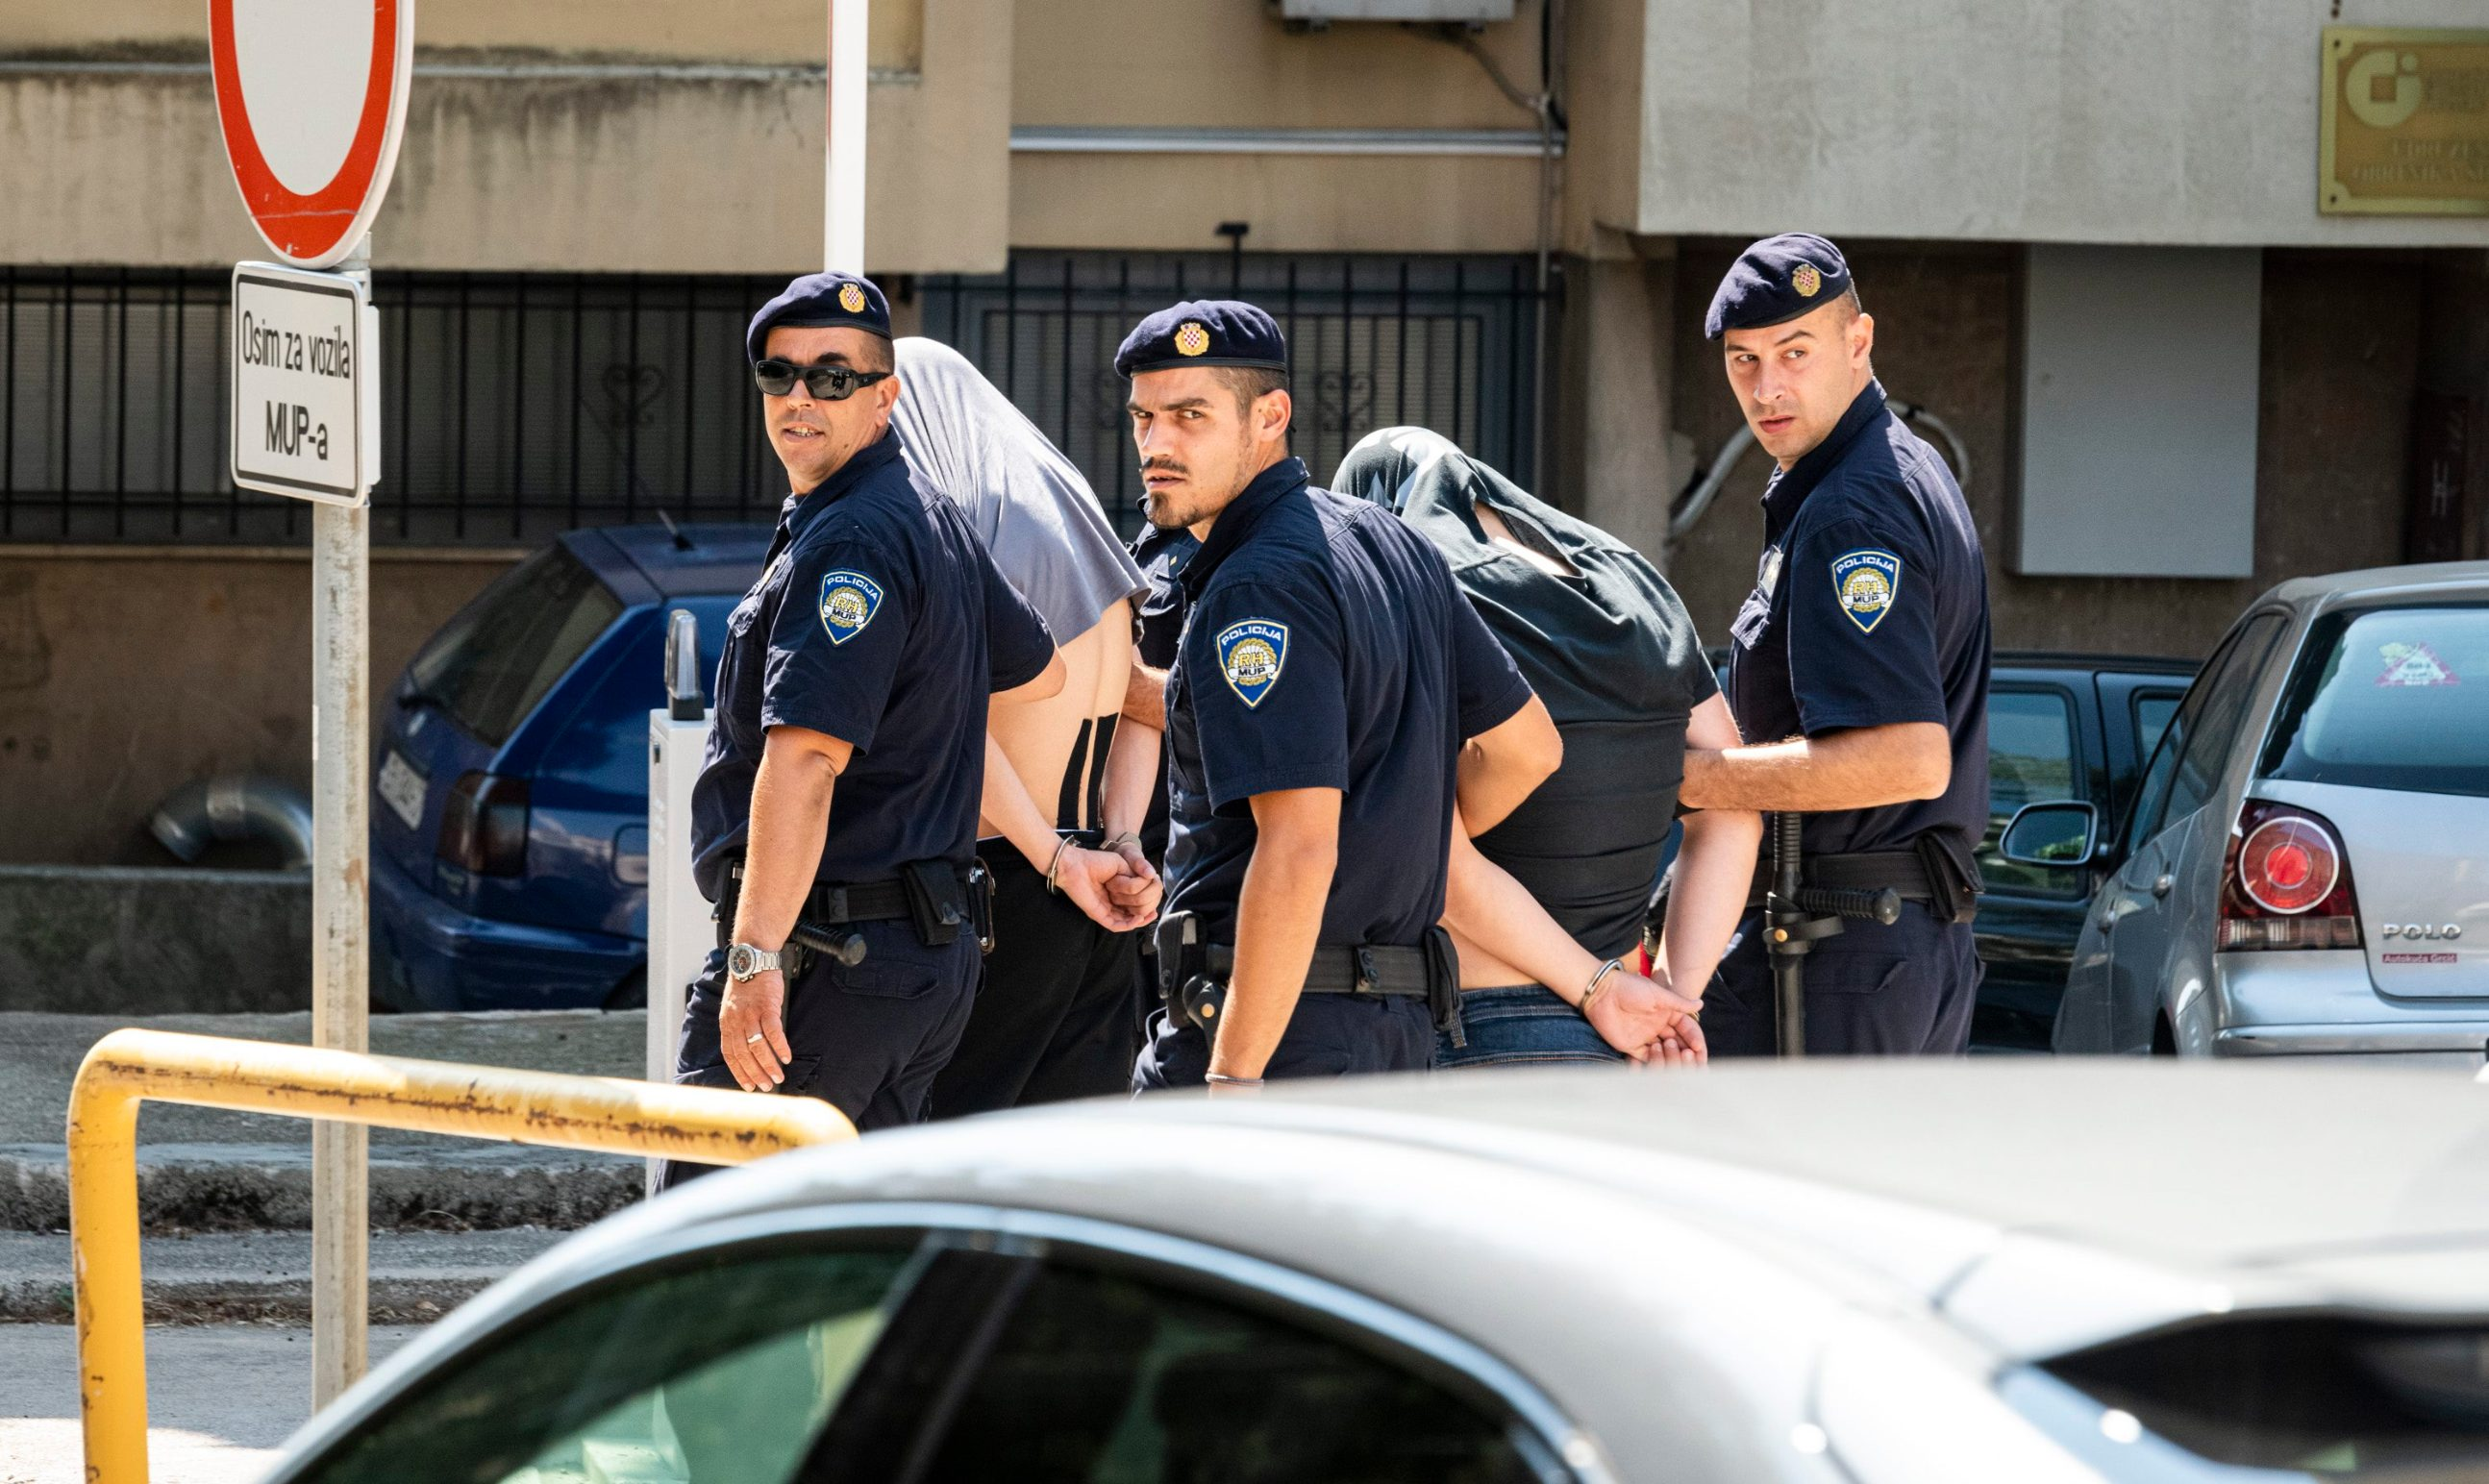 Sibenik, 280819. Privodjenje osumnjicenih za nedavne napade u Kninu i Djevrskama od policijske postaje do suda. Foto: Niksa Stipanicev / CROPIX